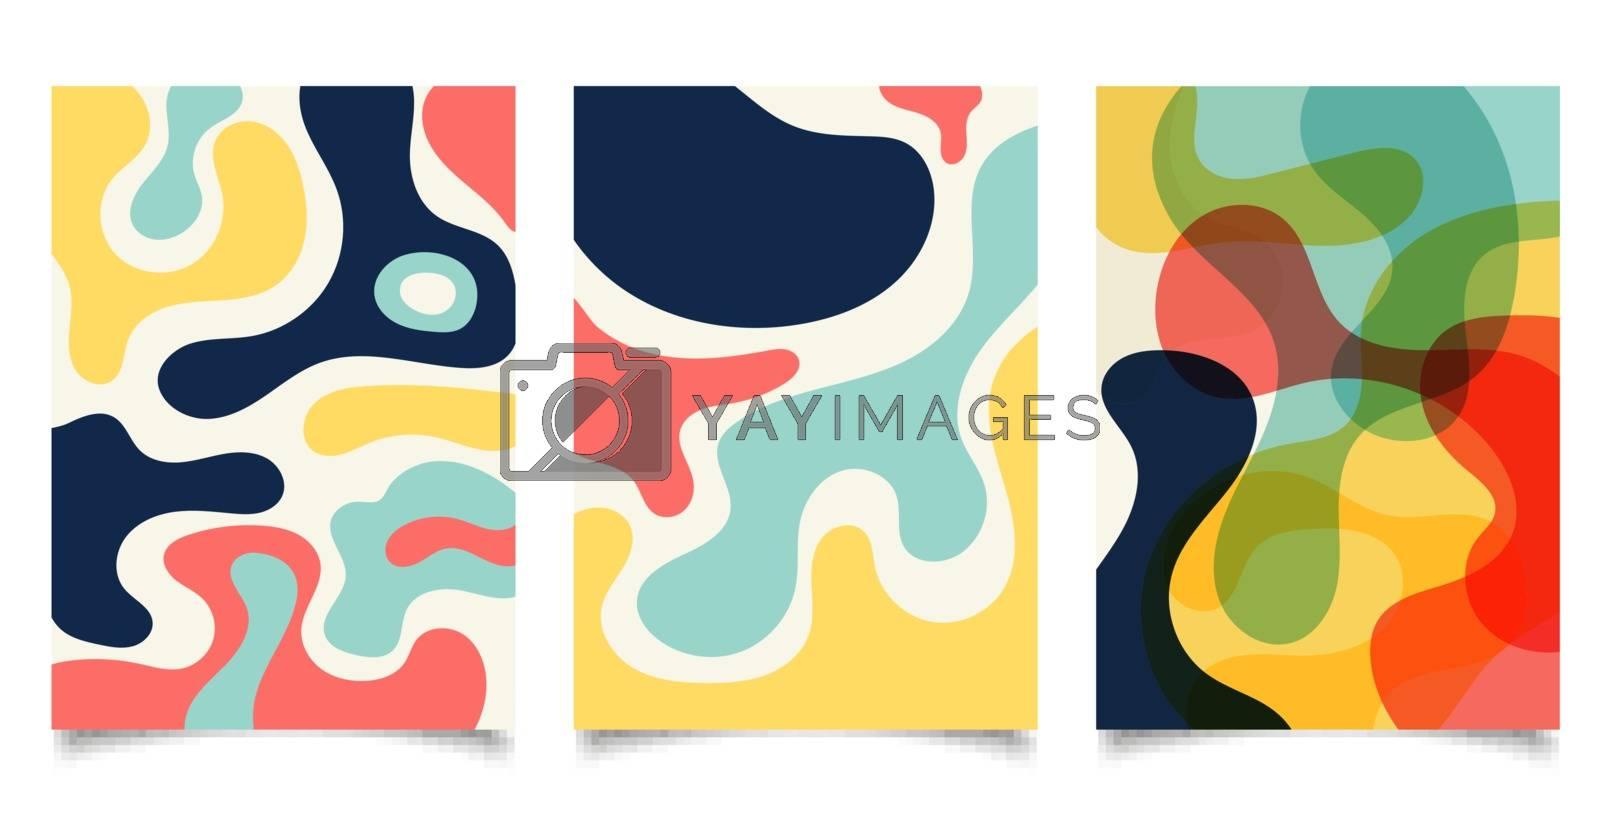 Set of brochure template organic shapes design background. Minimal style. Vector illustration